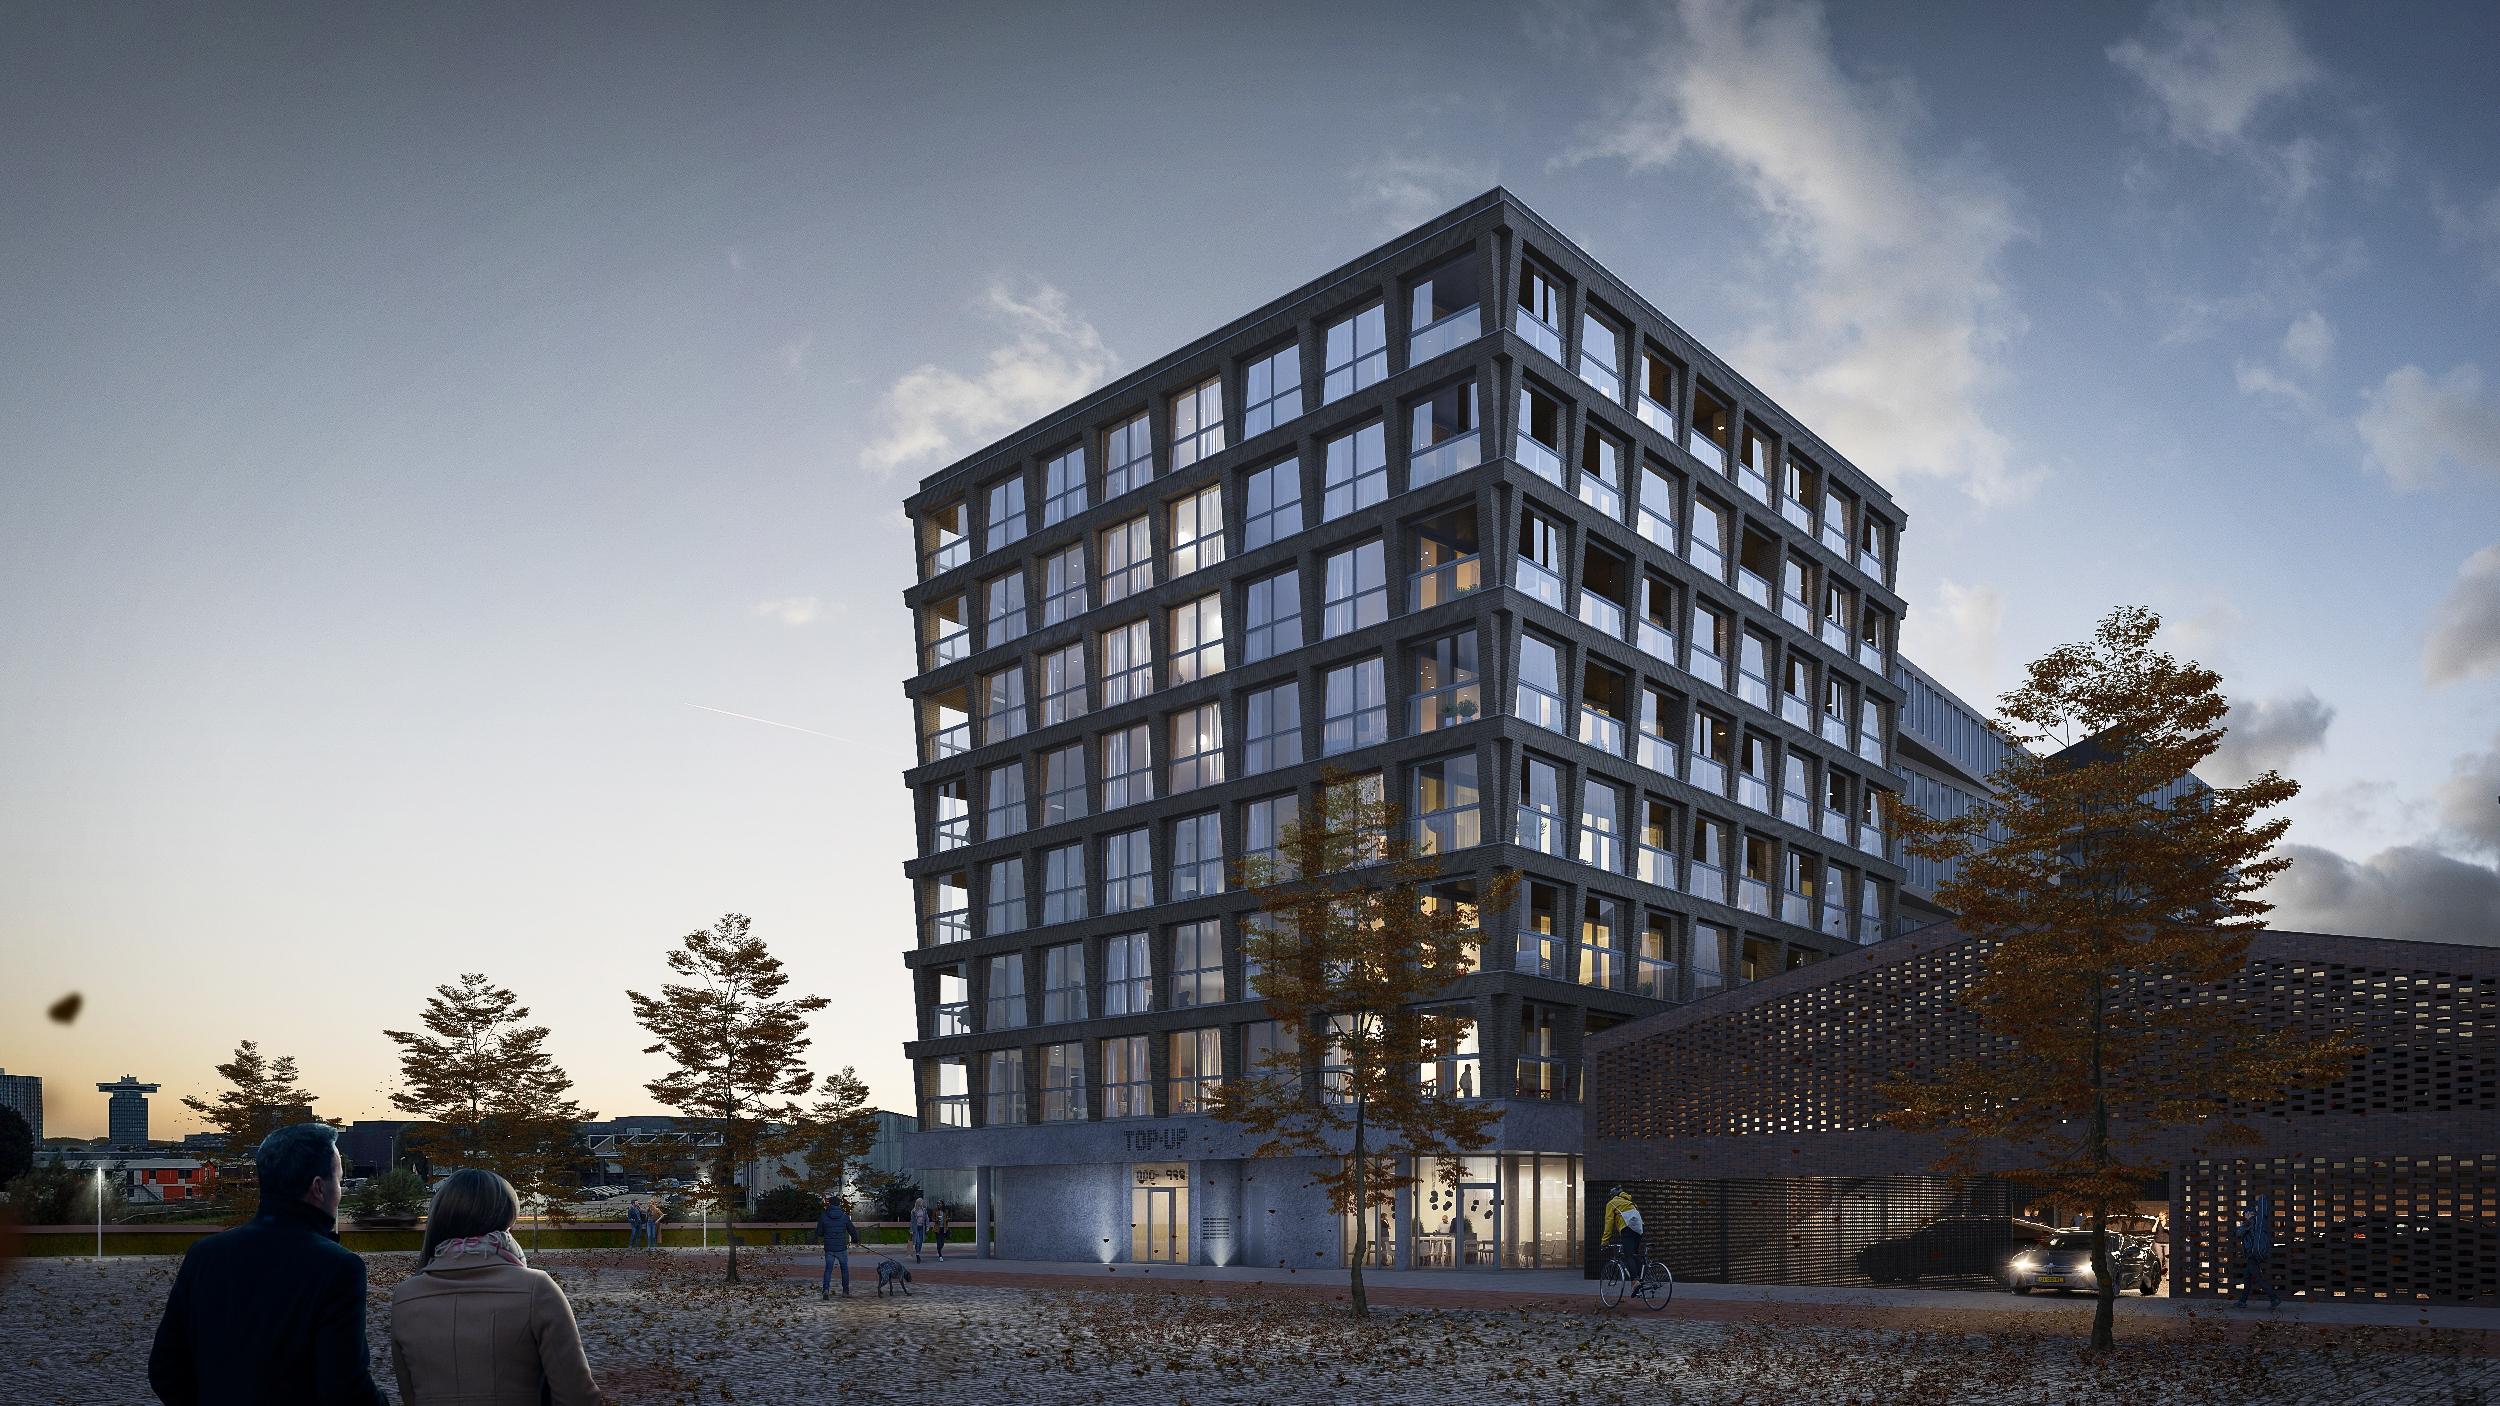 Bouw parkeergarage Top-Up Amsterdam gestart